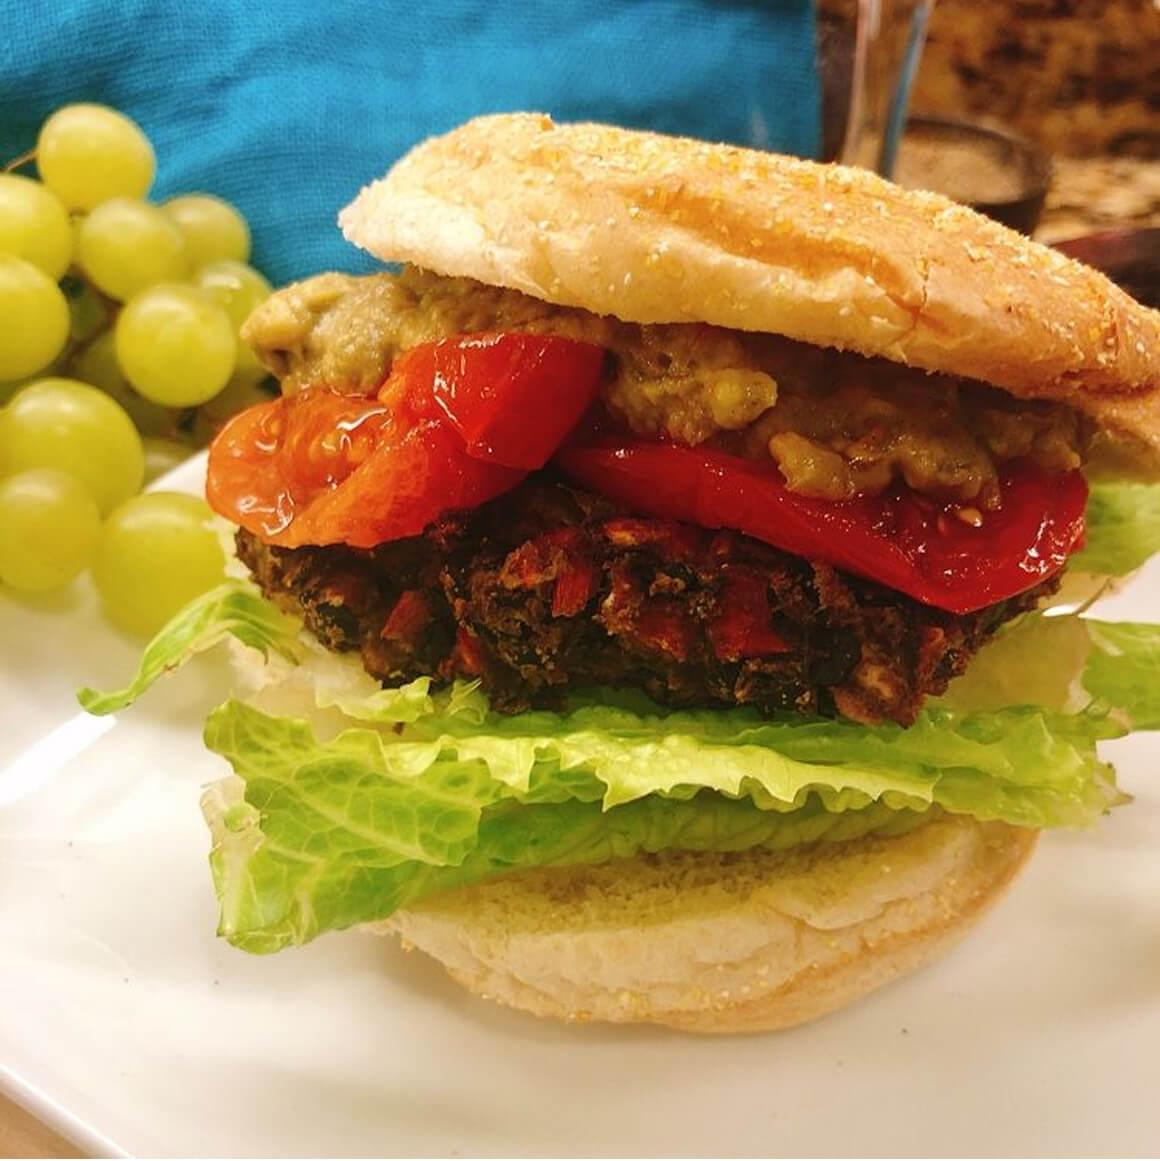 The Meatlover's Black Bean Burger